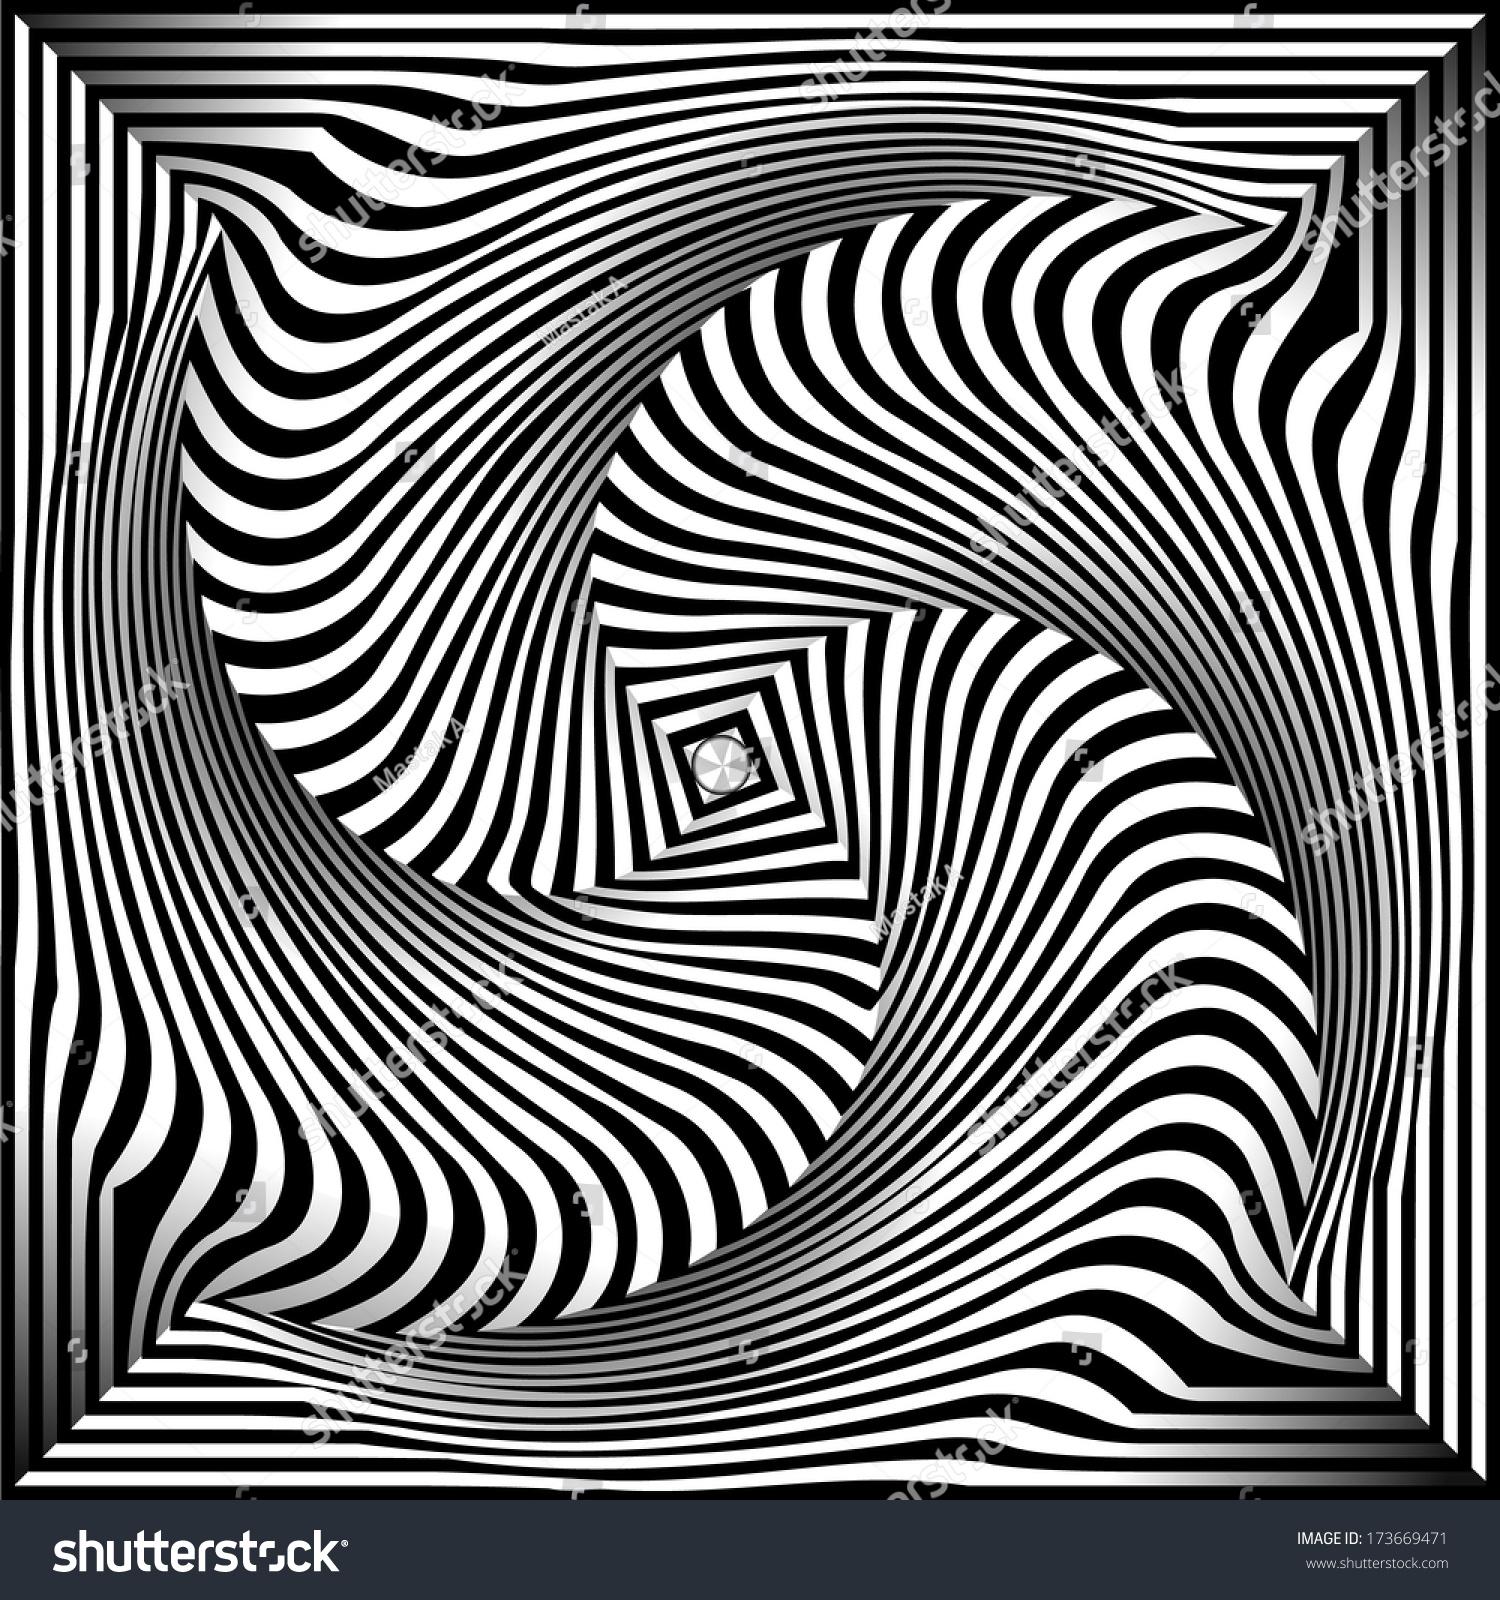 optical illusions wallpaper abstract - photo #45